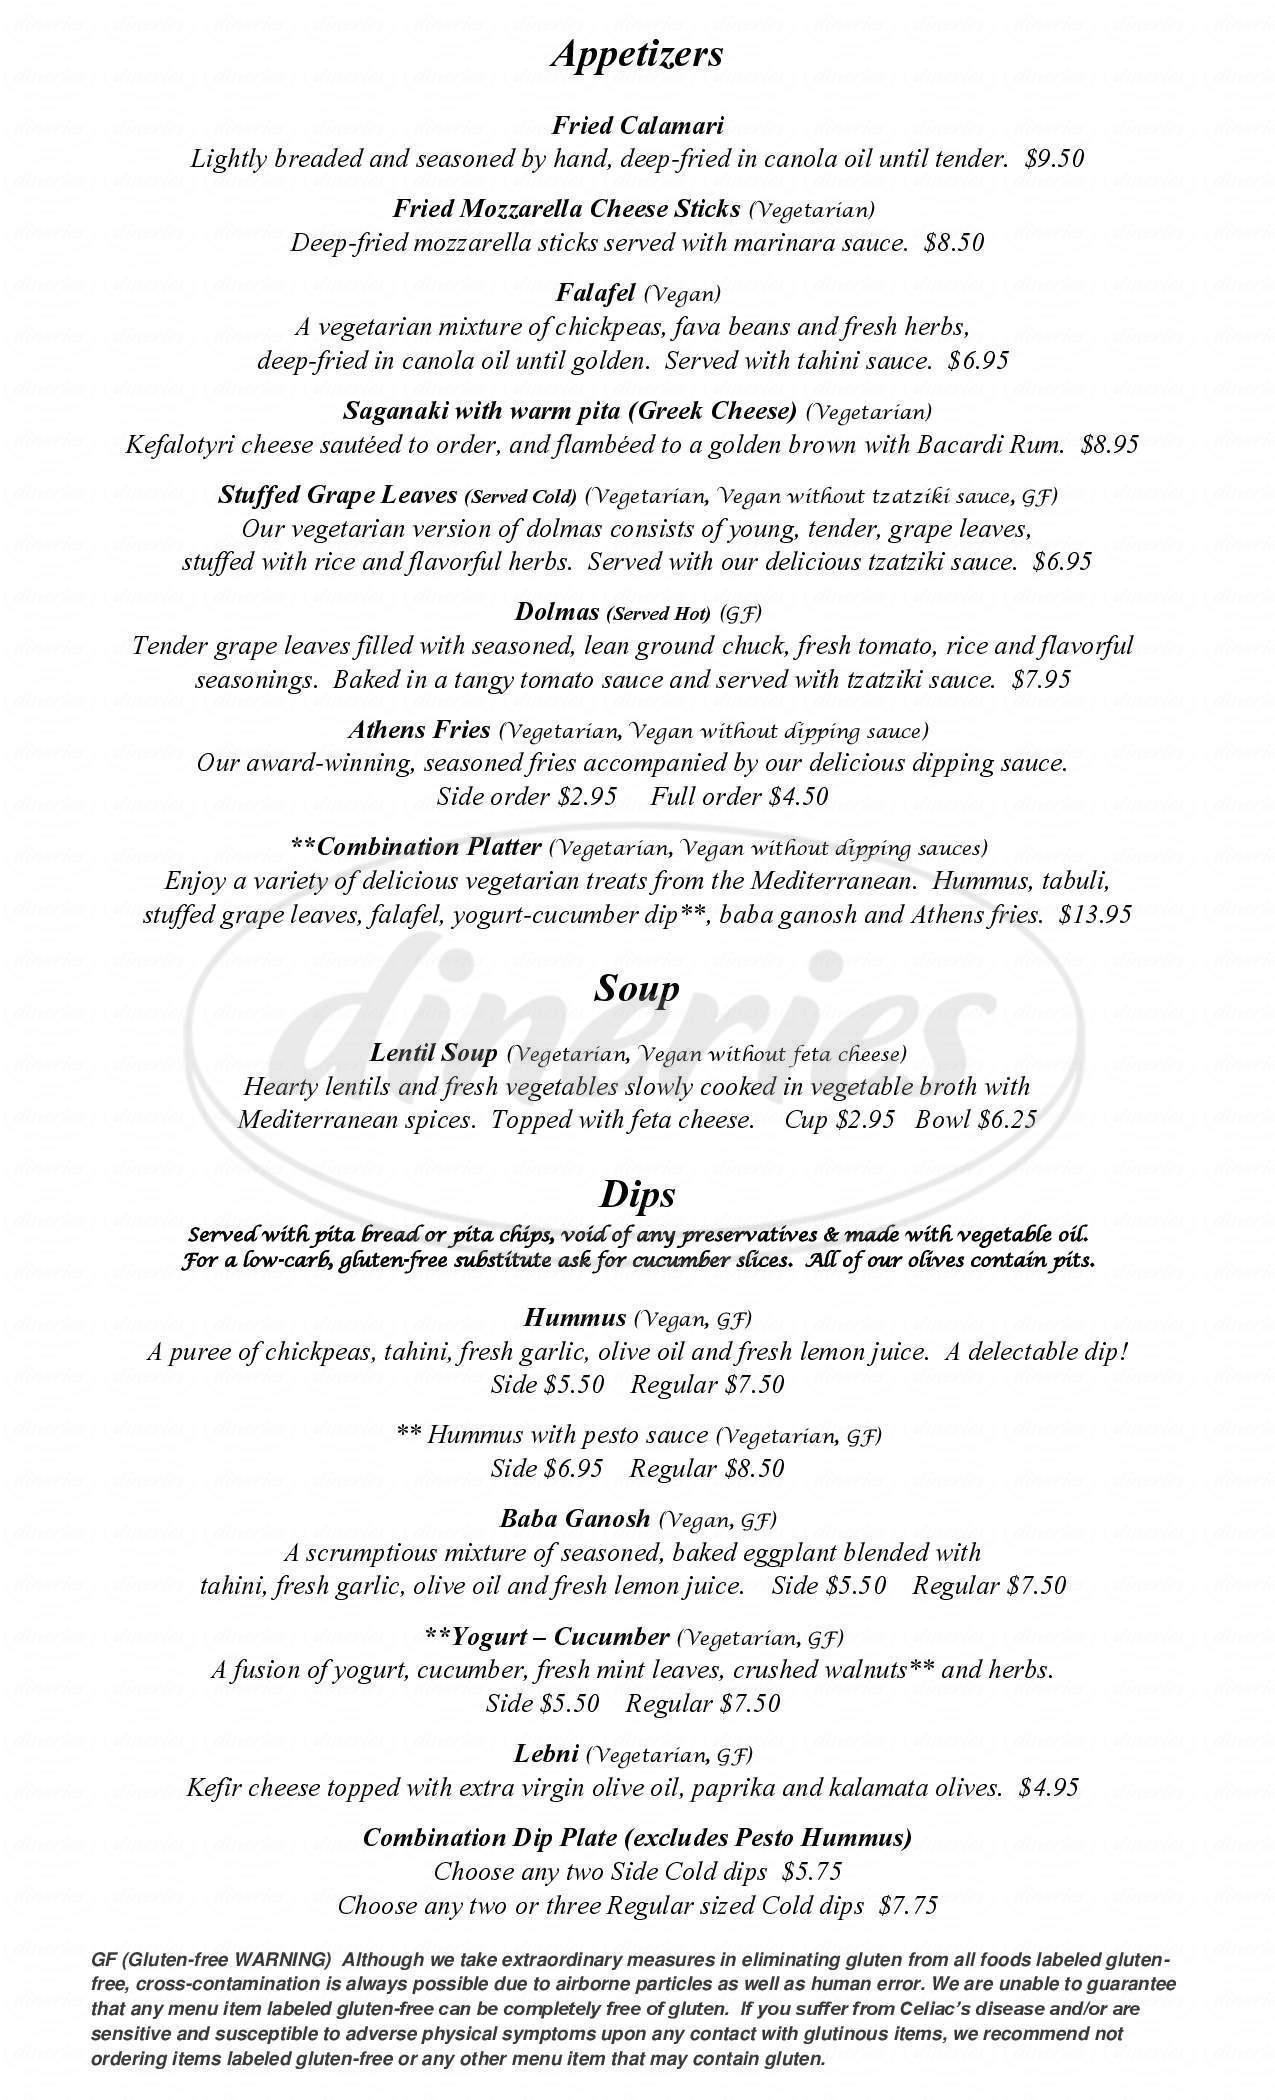 menu for Paymon's Mediterranean Cafe & Lounge